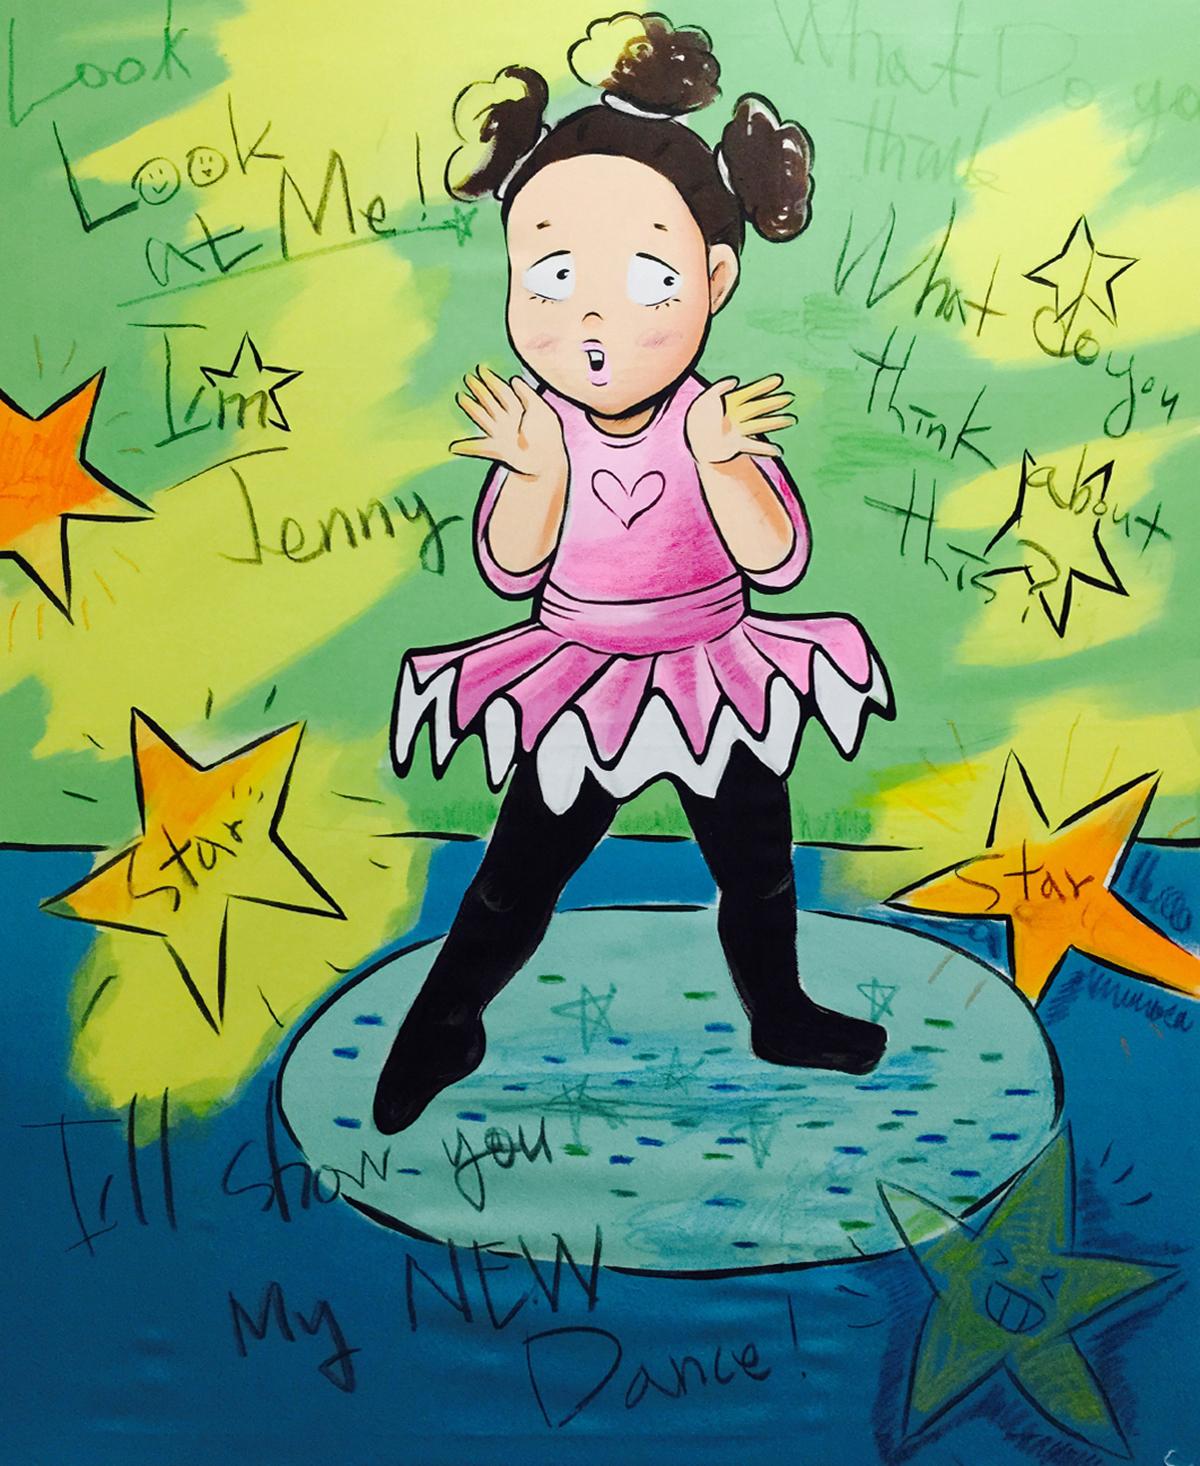 Star Jenny